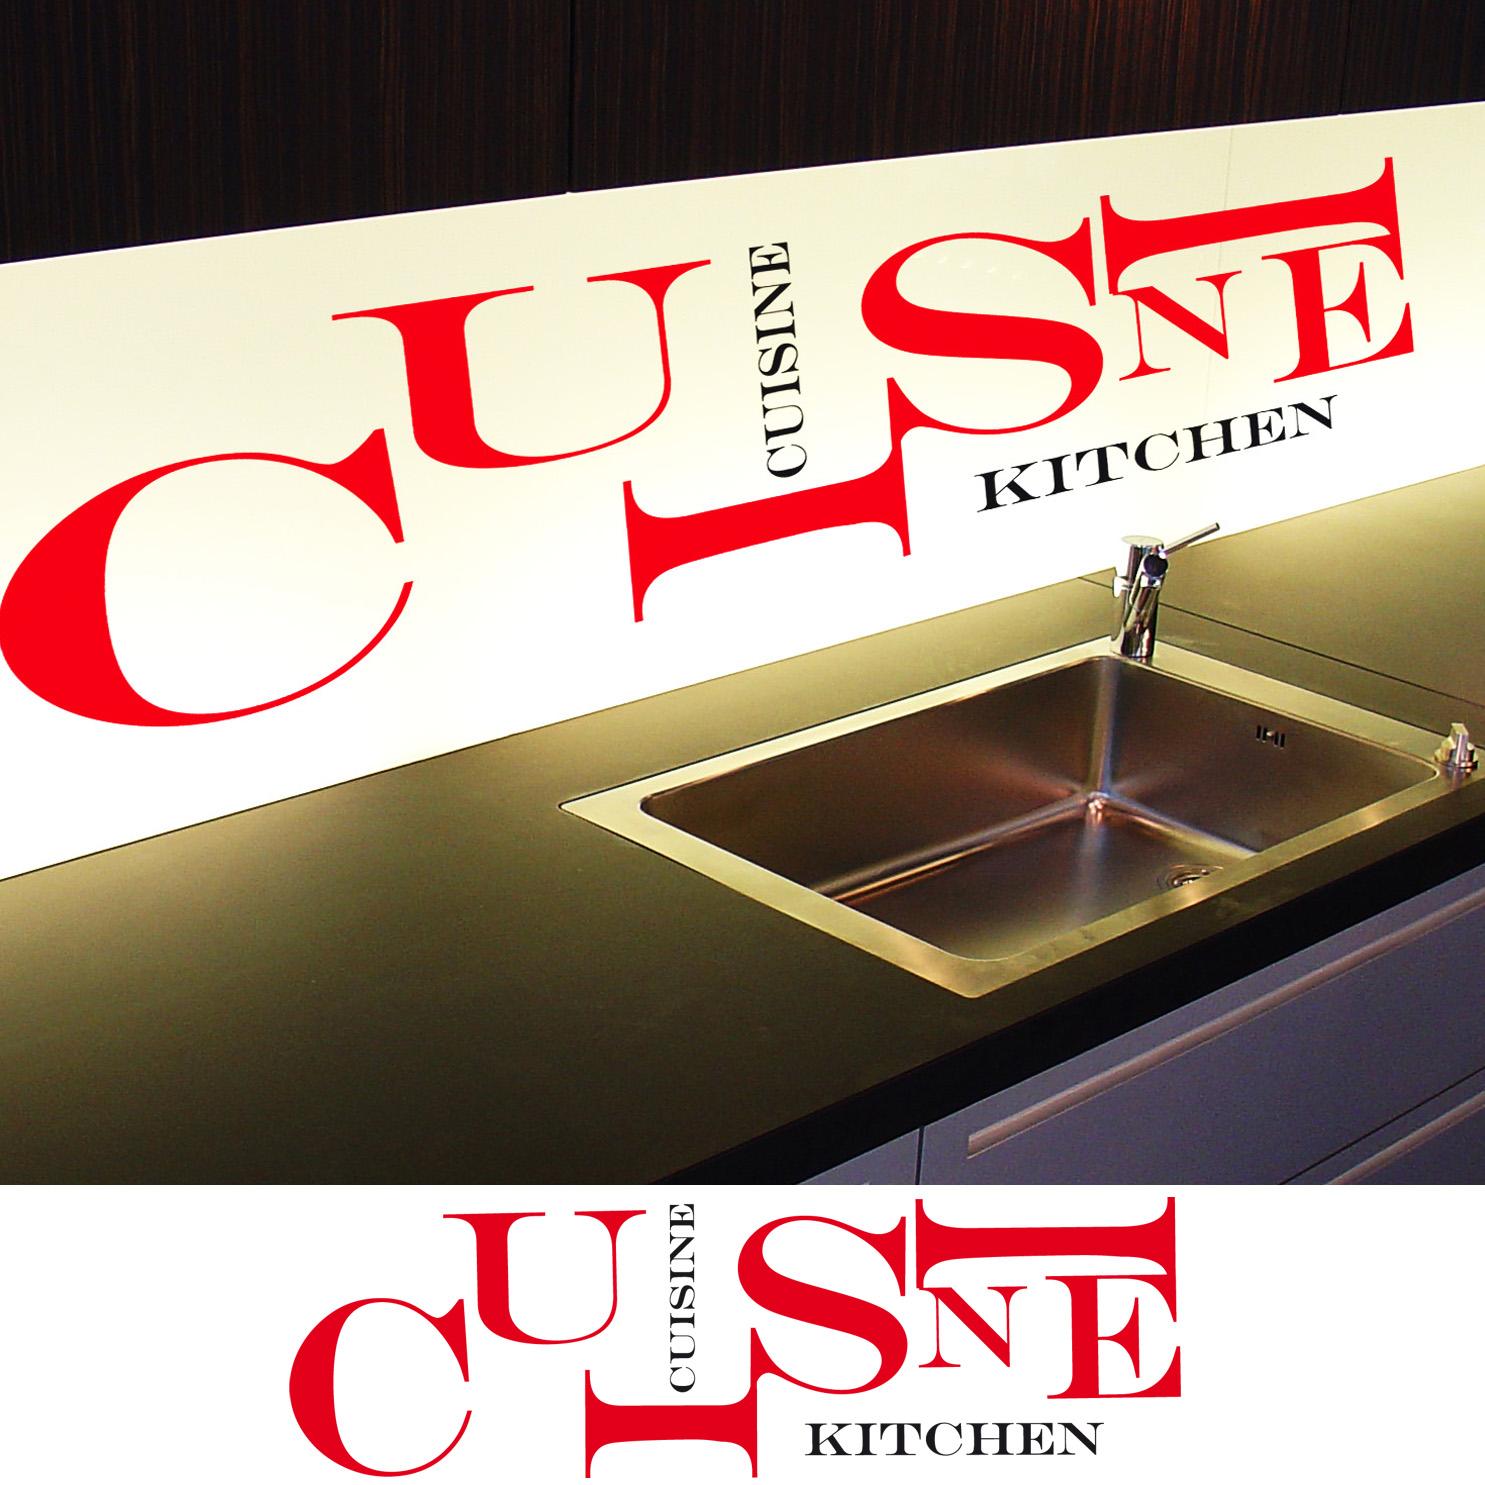 stickers d co cuisine lettres horizontales deco cuisine destock stickers. Black Bedroom Furniture Sets. Home Design Ideas